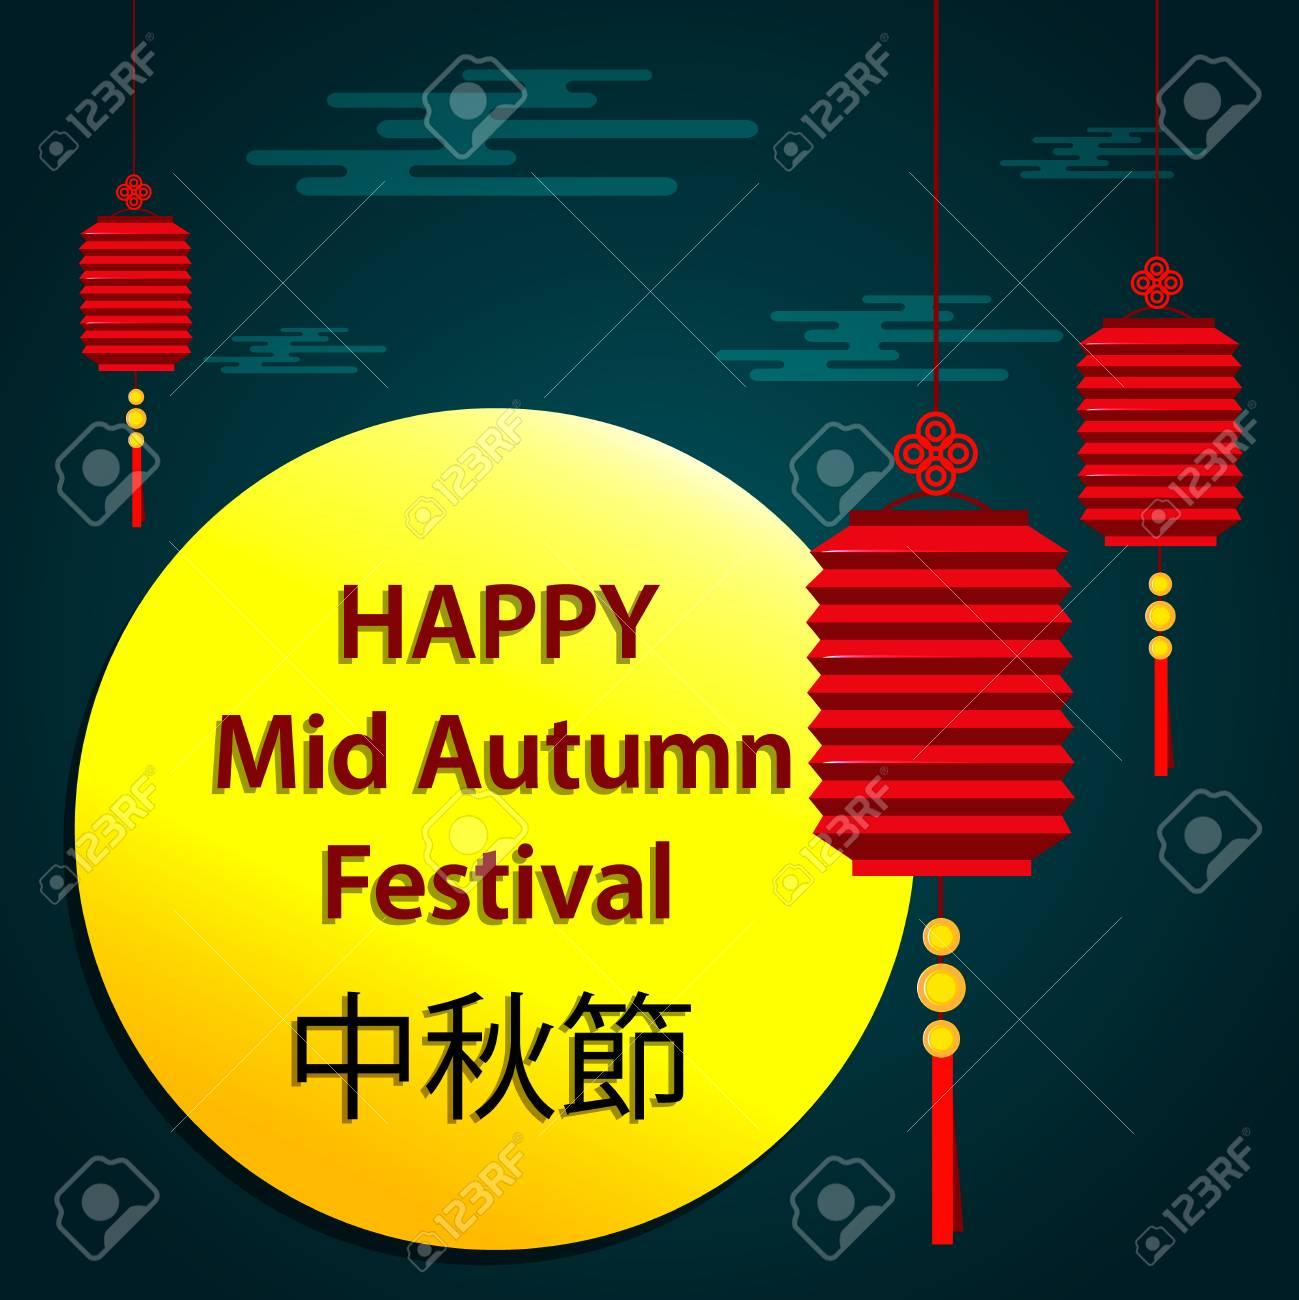 Mid autumn festival greeting card littering translates as happy mid autumn festival greeting card littering translates as happy mid autumn festival chuseok m4hsunfo